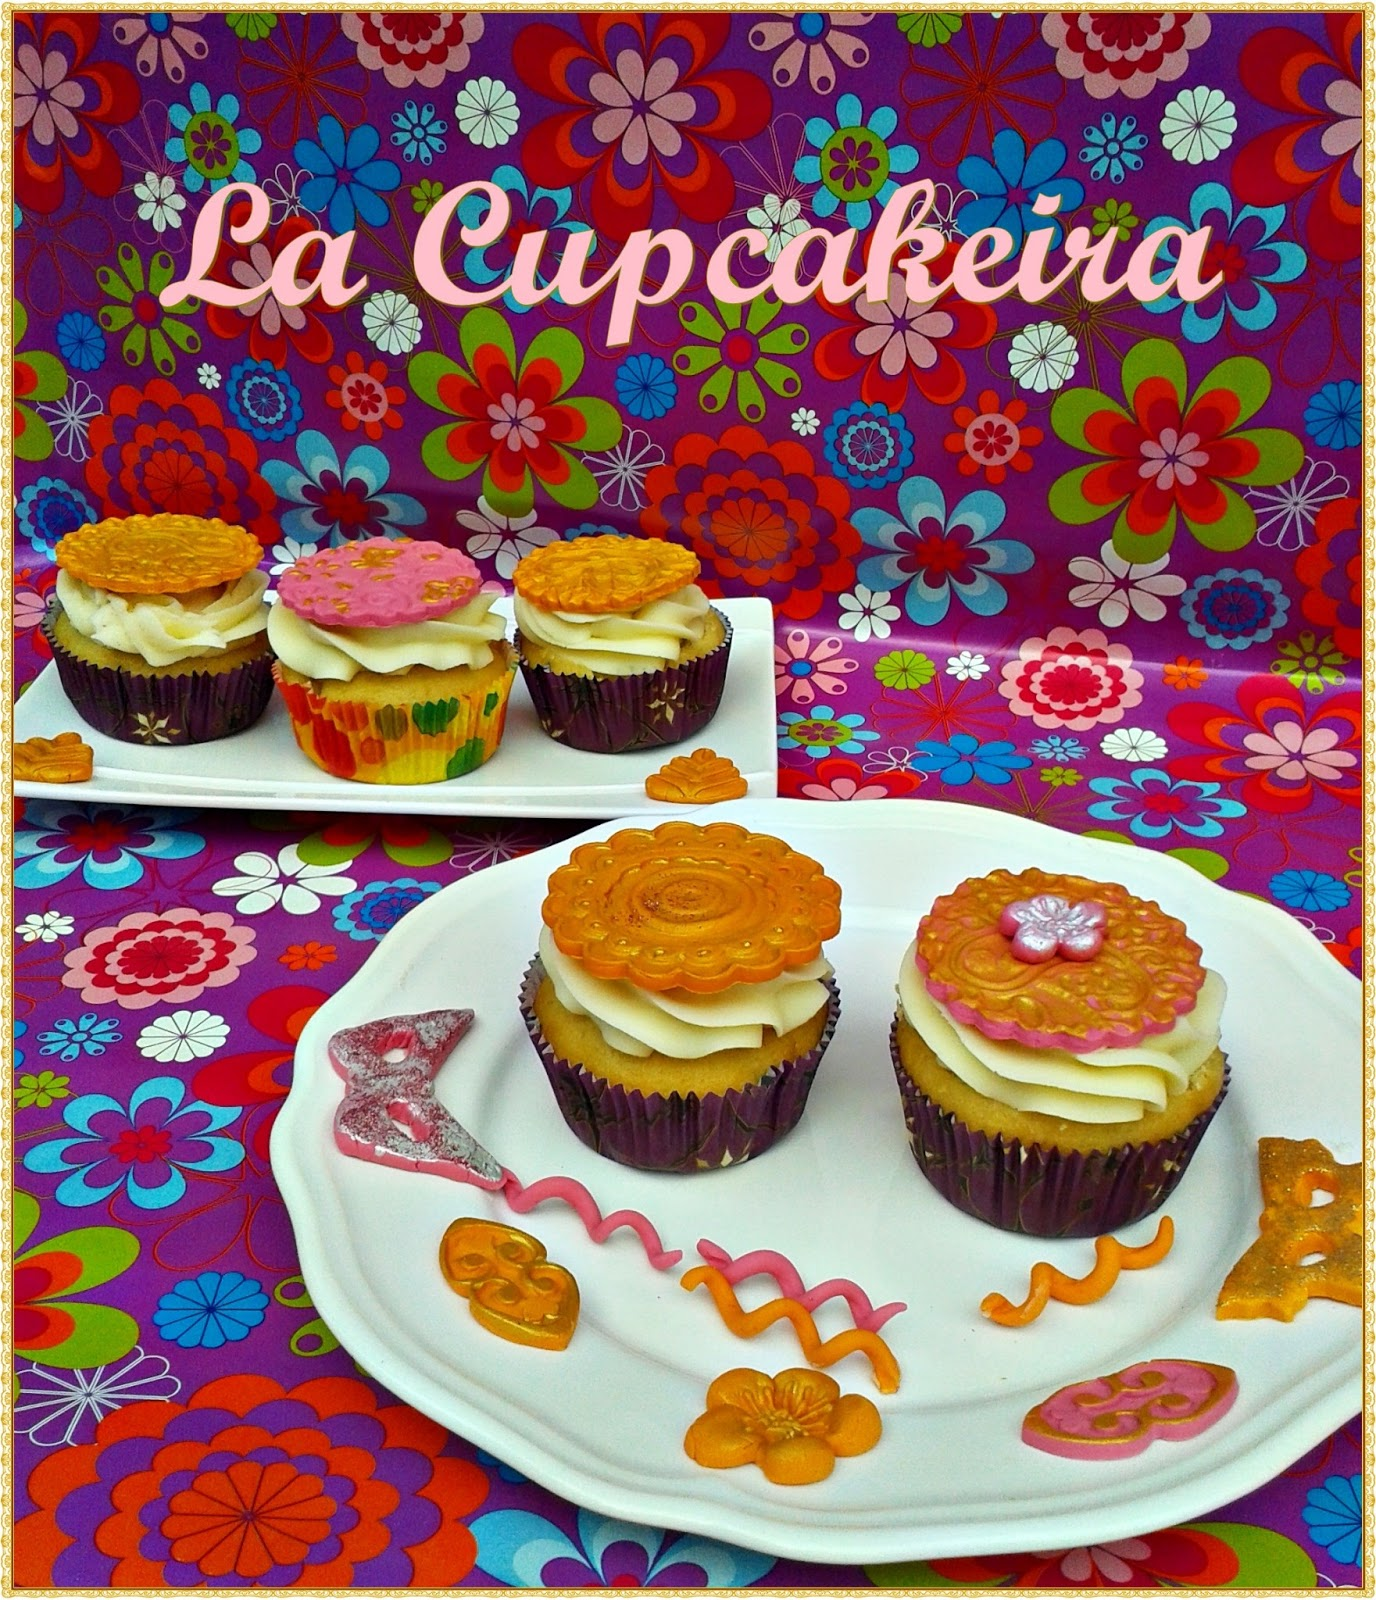 La cupcakeira bollywood cupcakes - Cupcakes tenerife ...